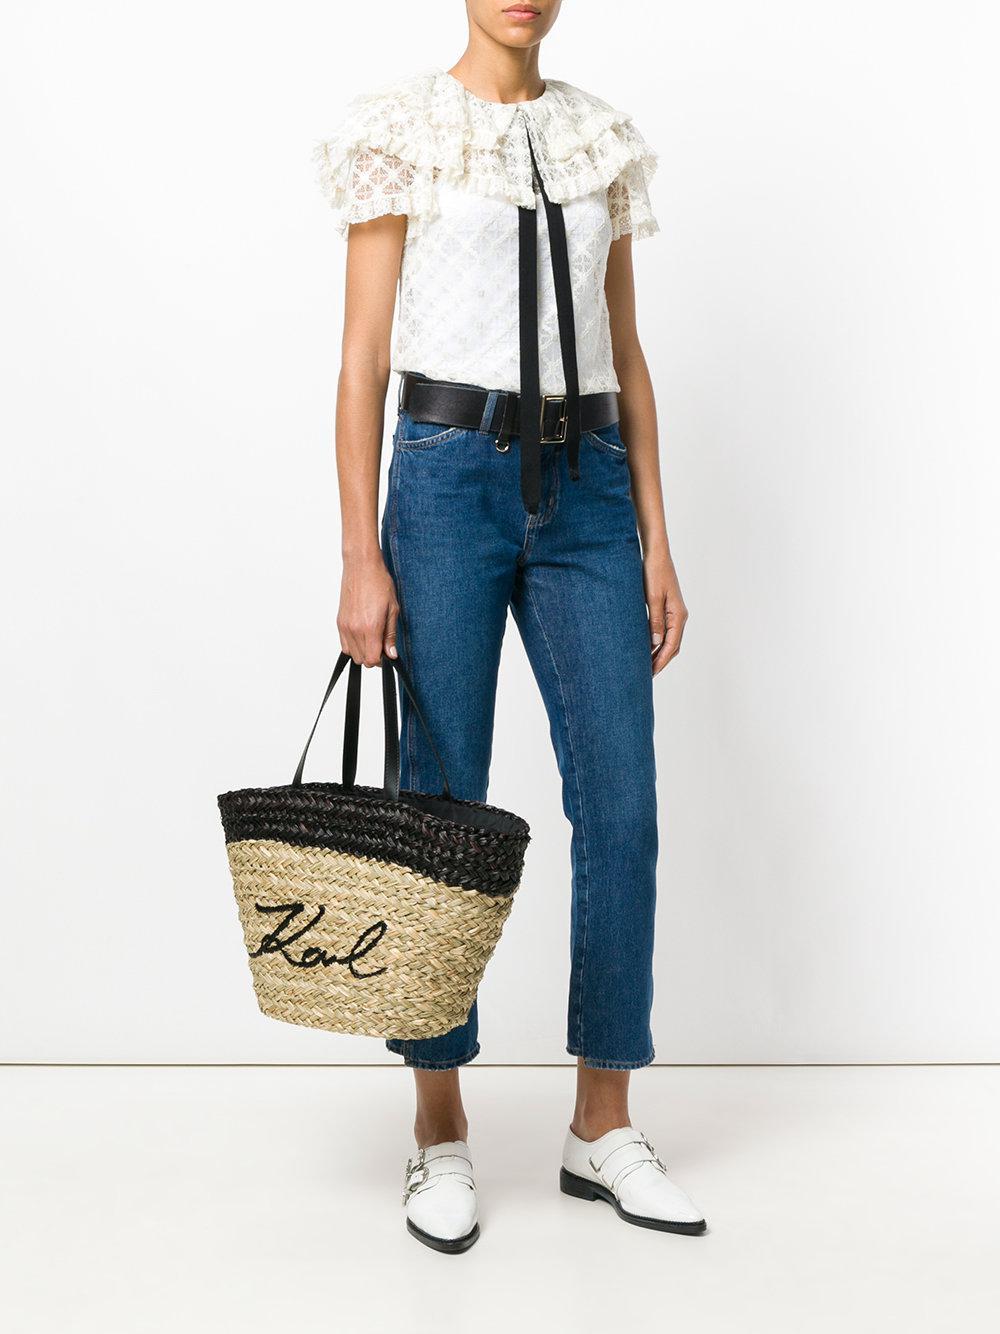 Karl Lagerfeld K/ikonik Straw Tote Bag